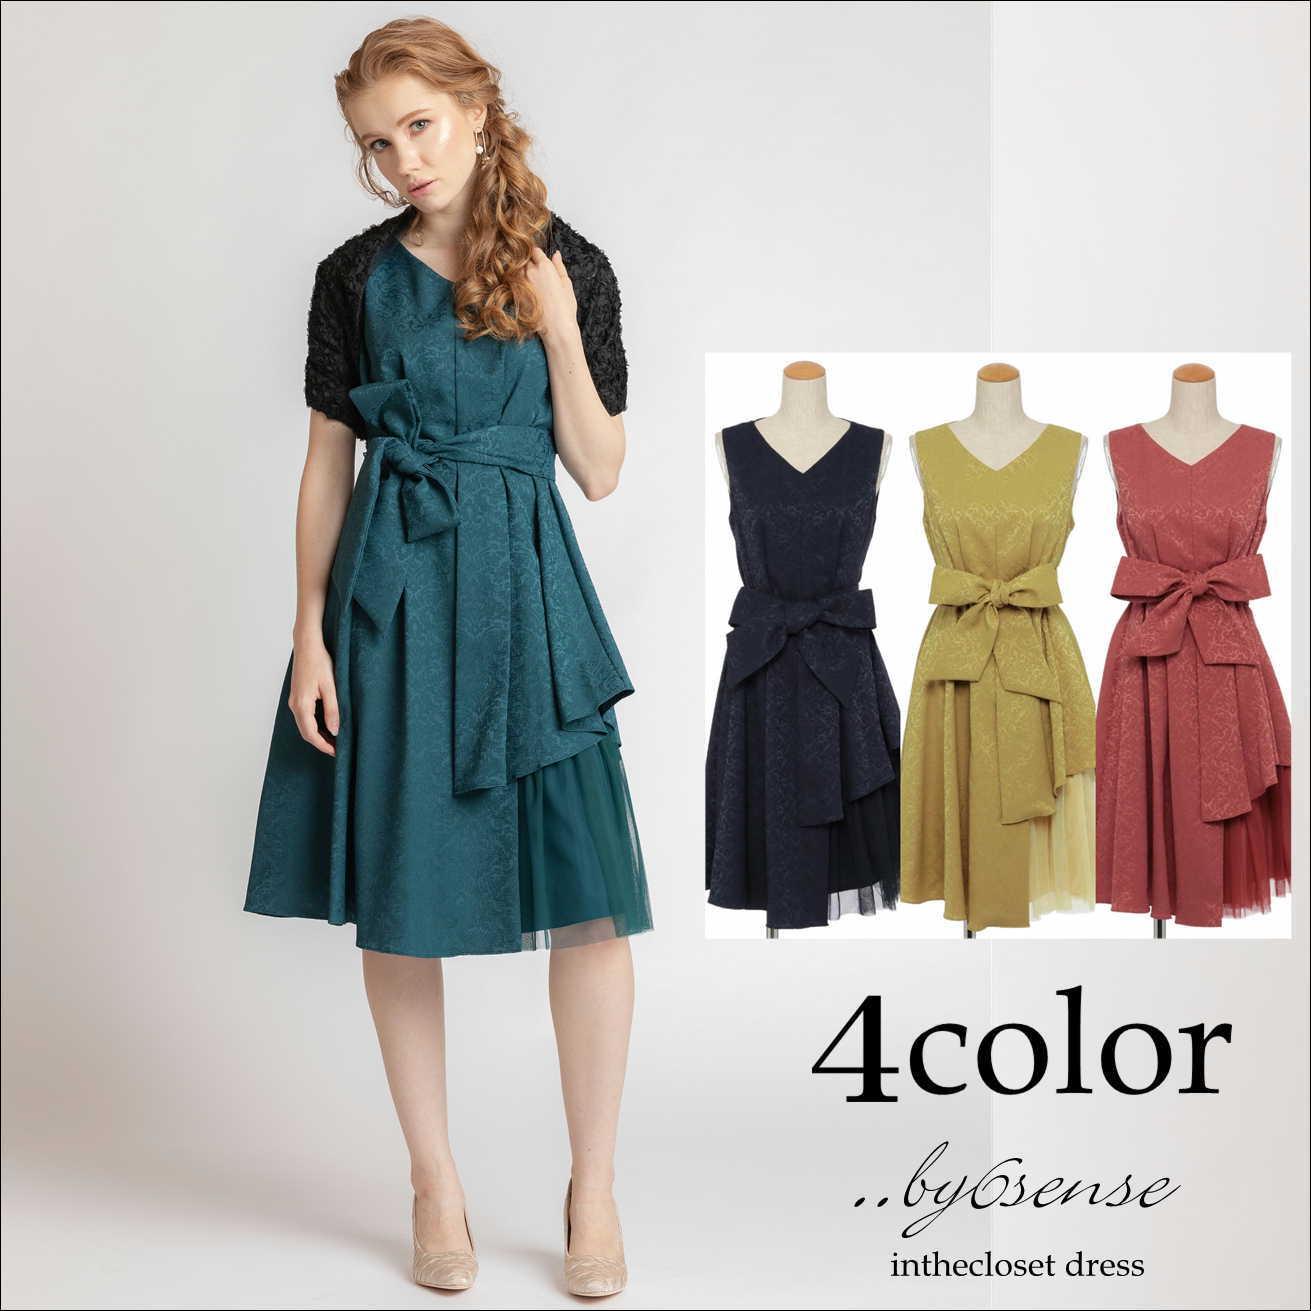 4color(グリーン) サッシュベルト付き裾アシメレースミドル丈ジャガードワンピース Dorry Doll(ドリードールドレス)